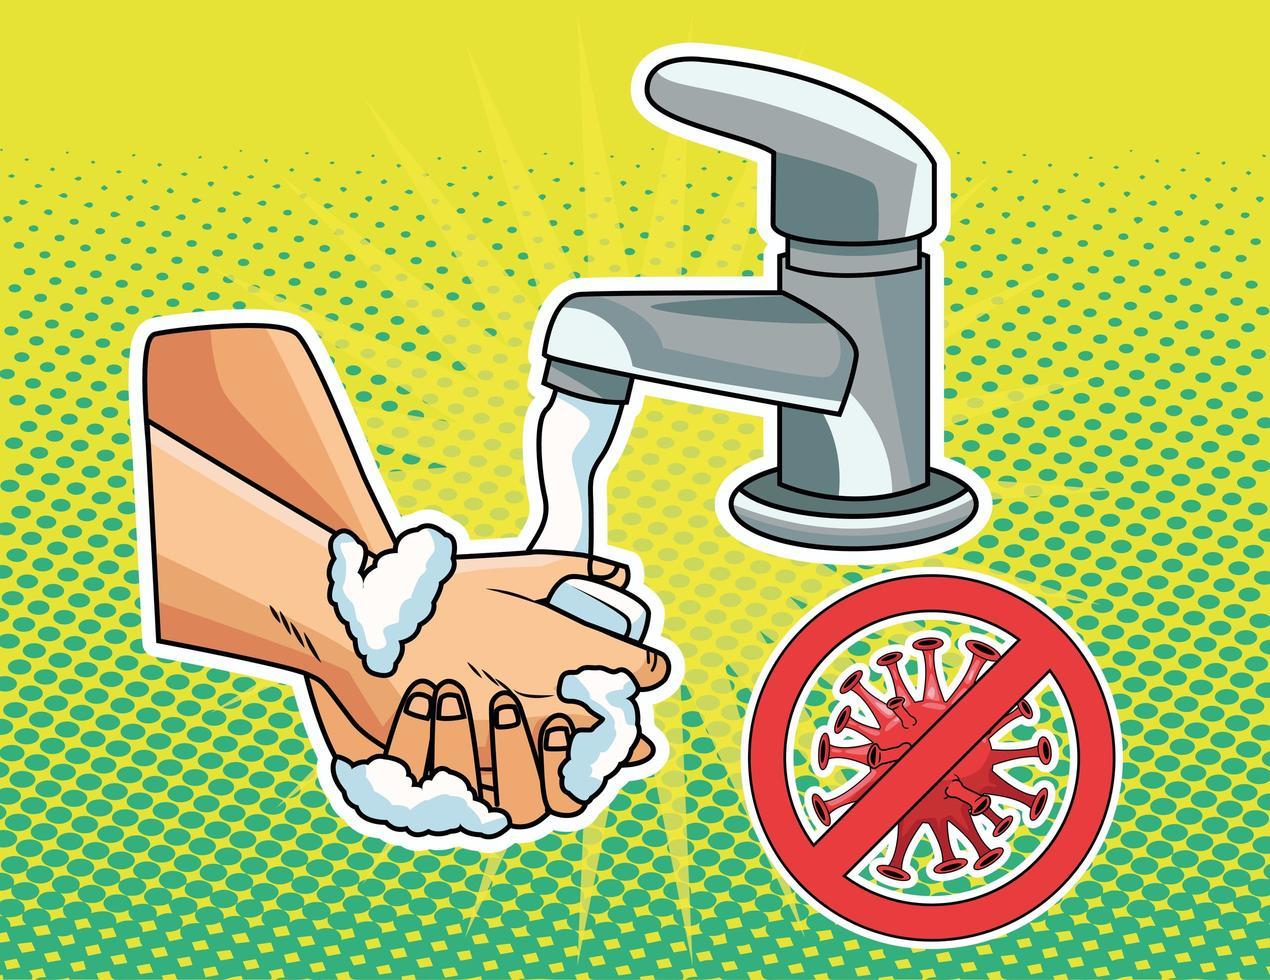 Hands washing prevention method  vector